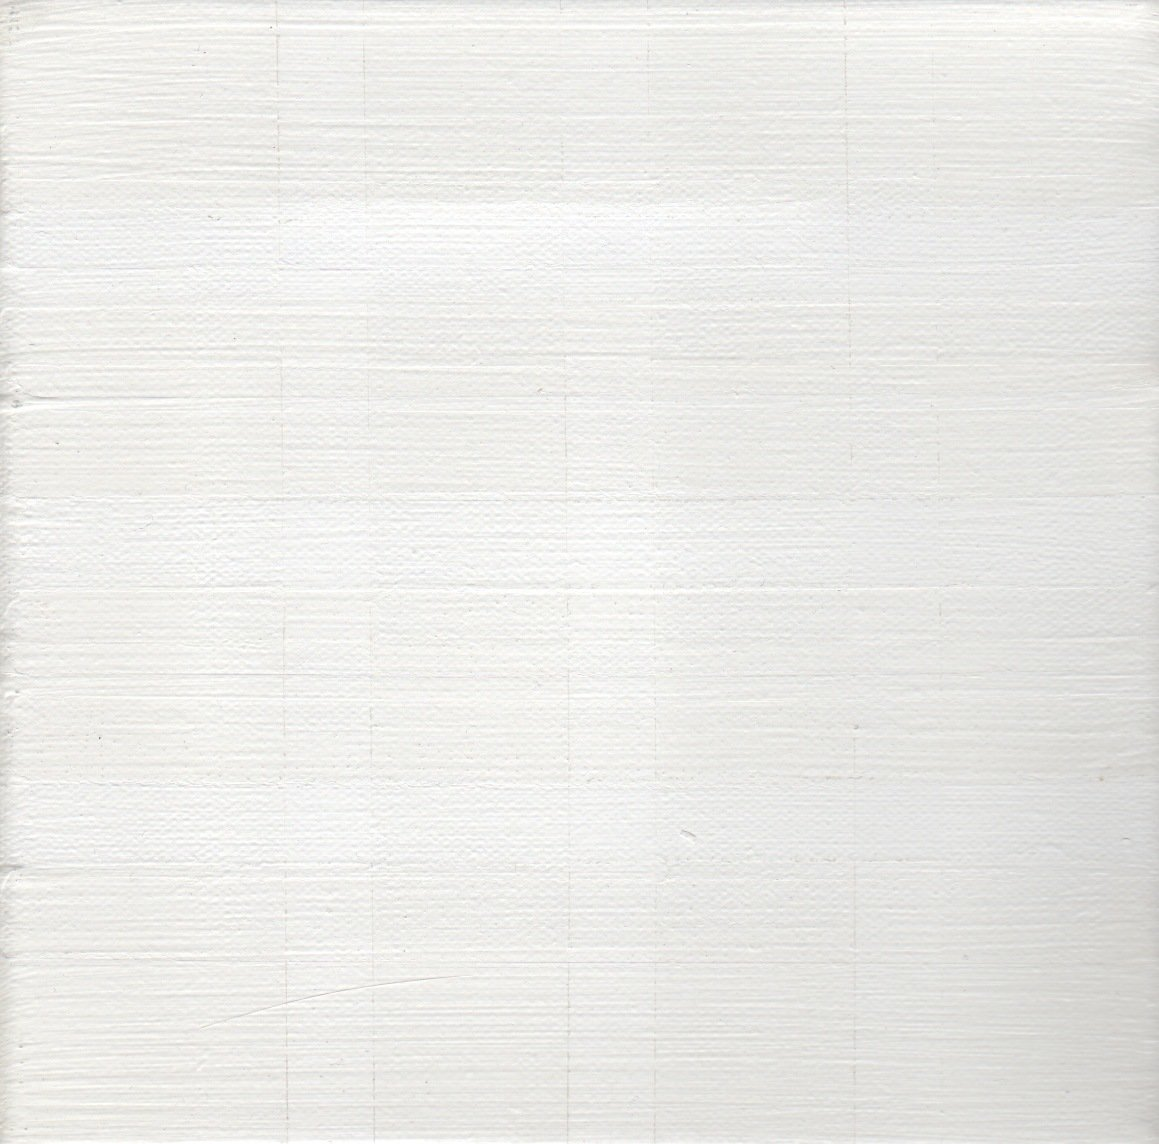 Polyphon/weiß/Polyphon/white 02